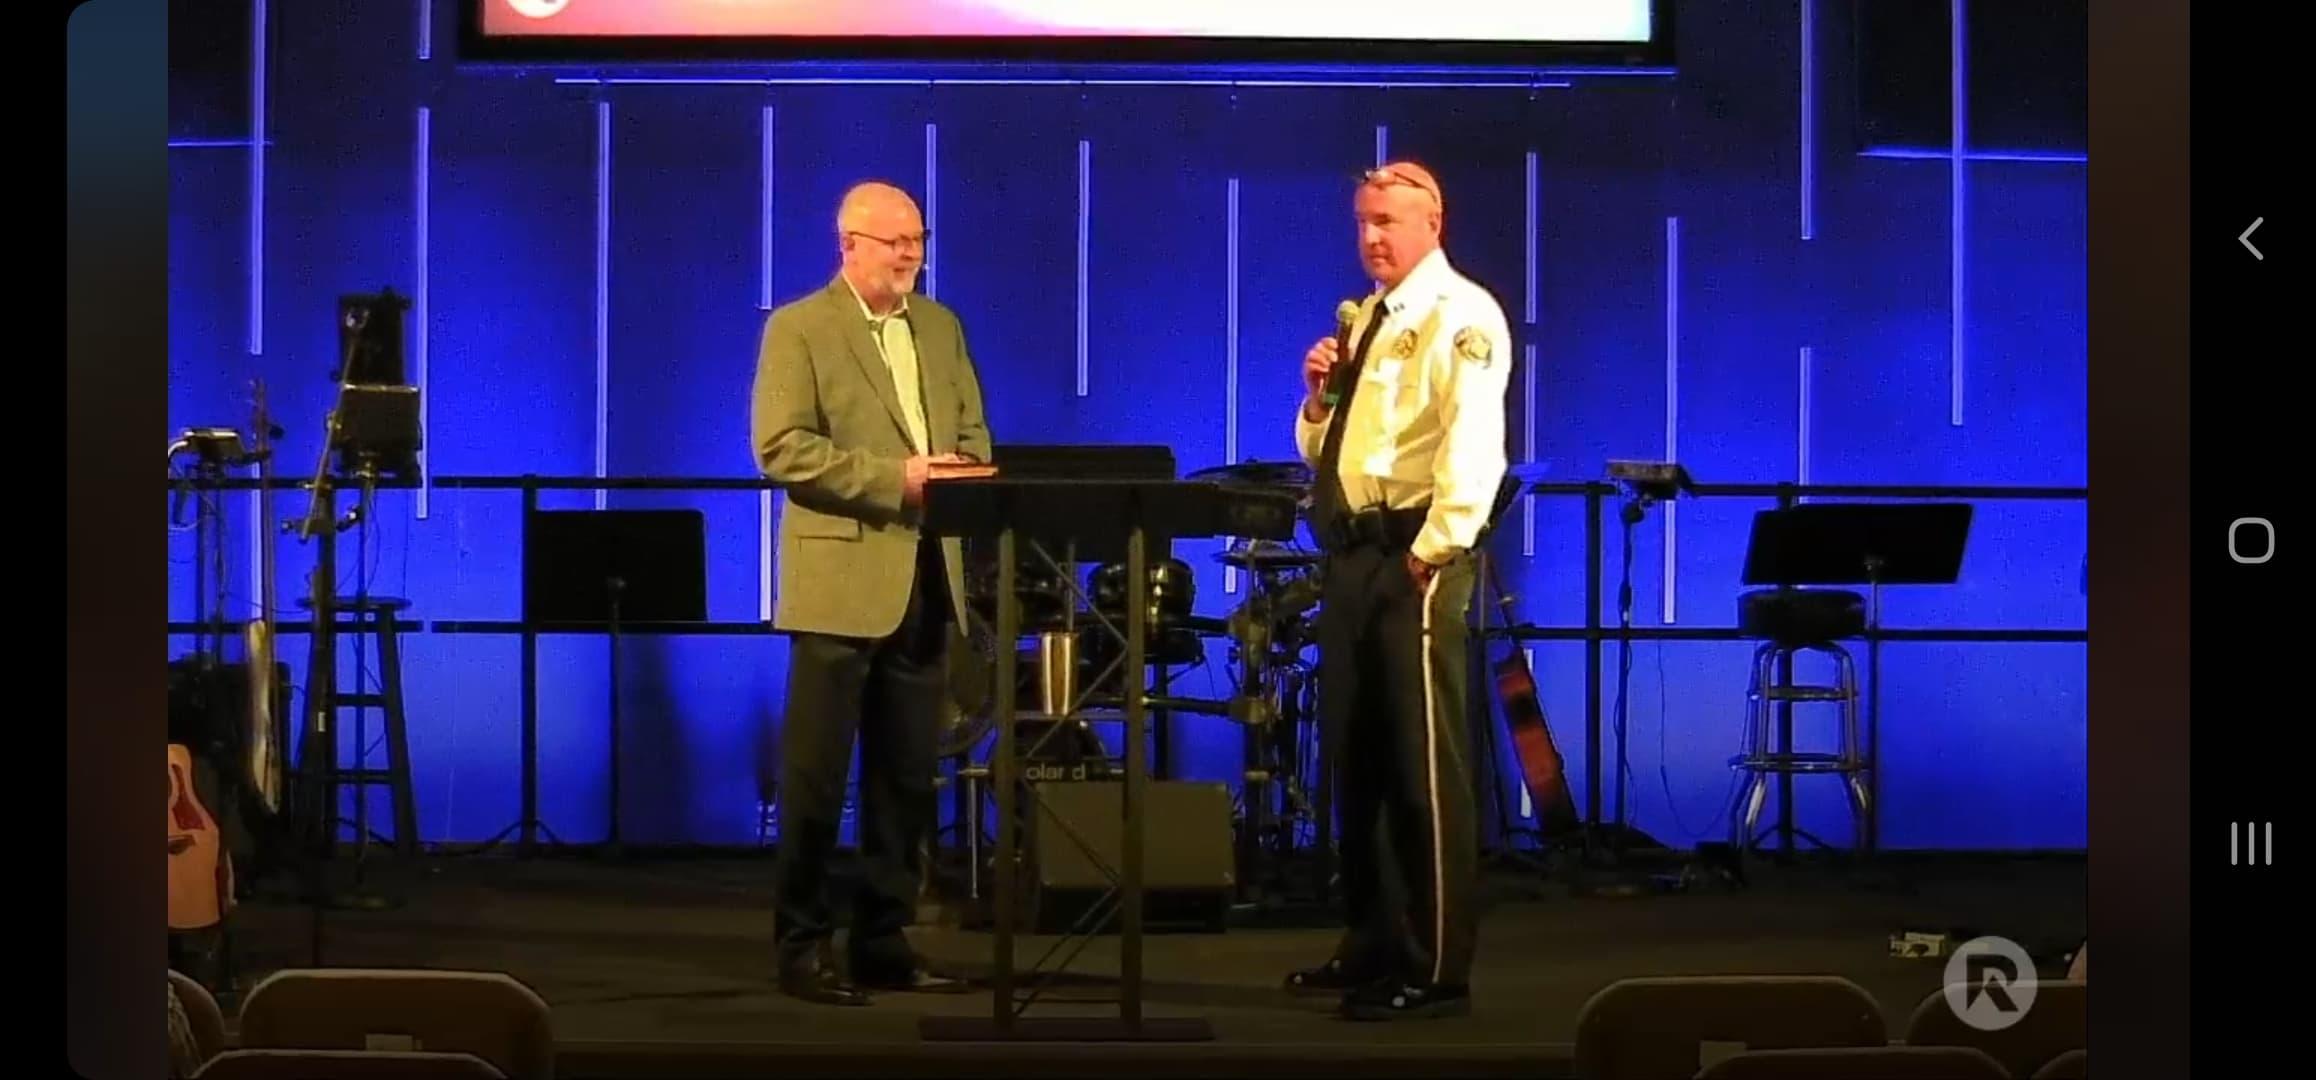 Trussville PD Captain speaks at Ridgecrest Baptist Church